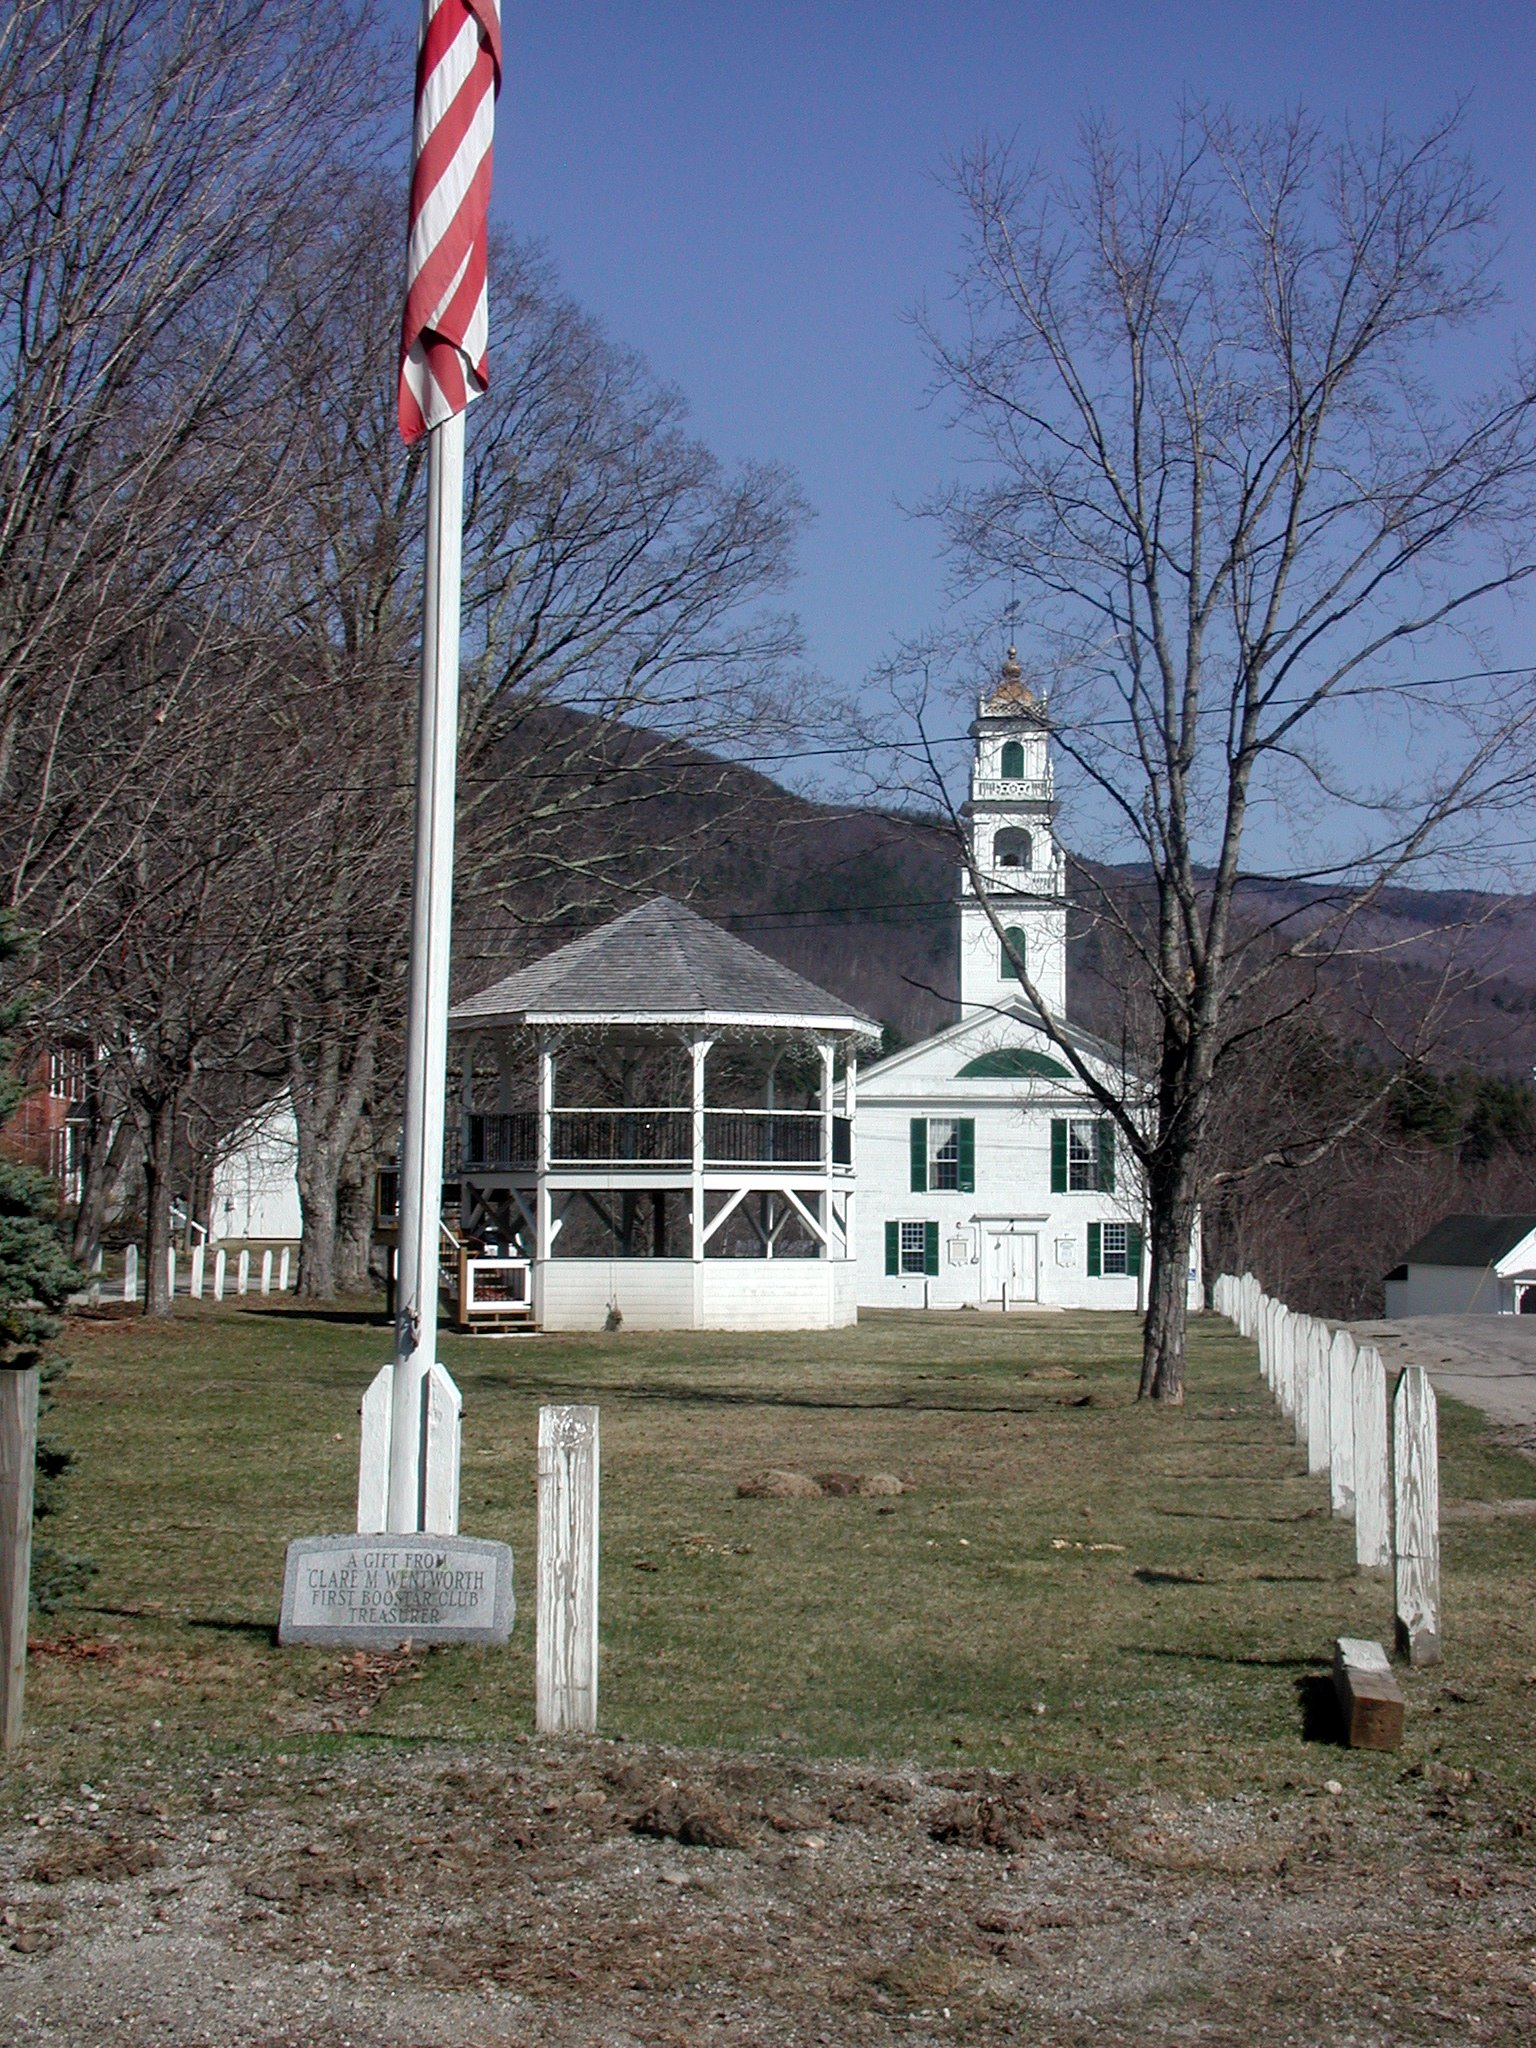 Wentworth New Hampshire  Wikipedia